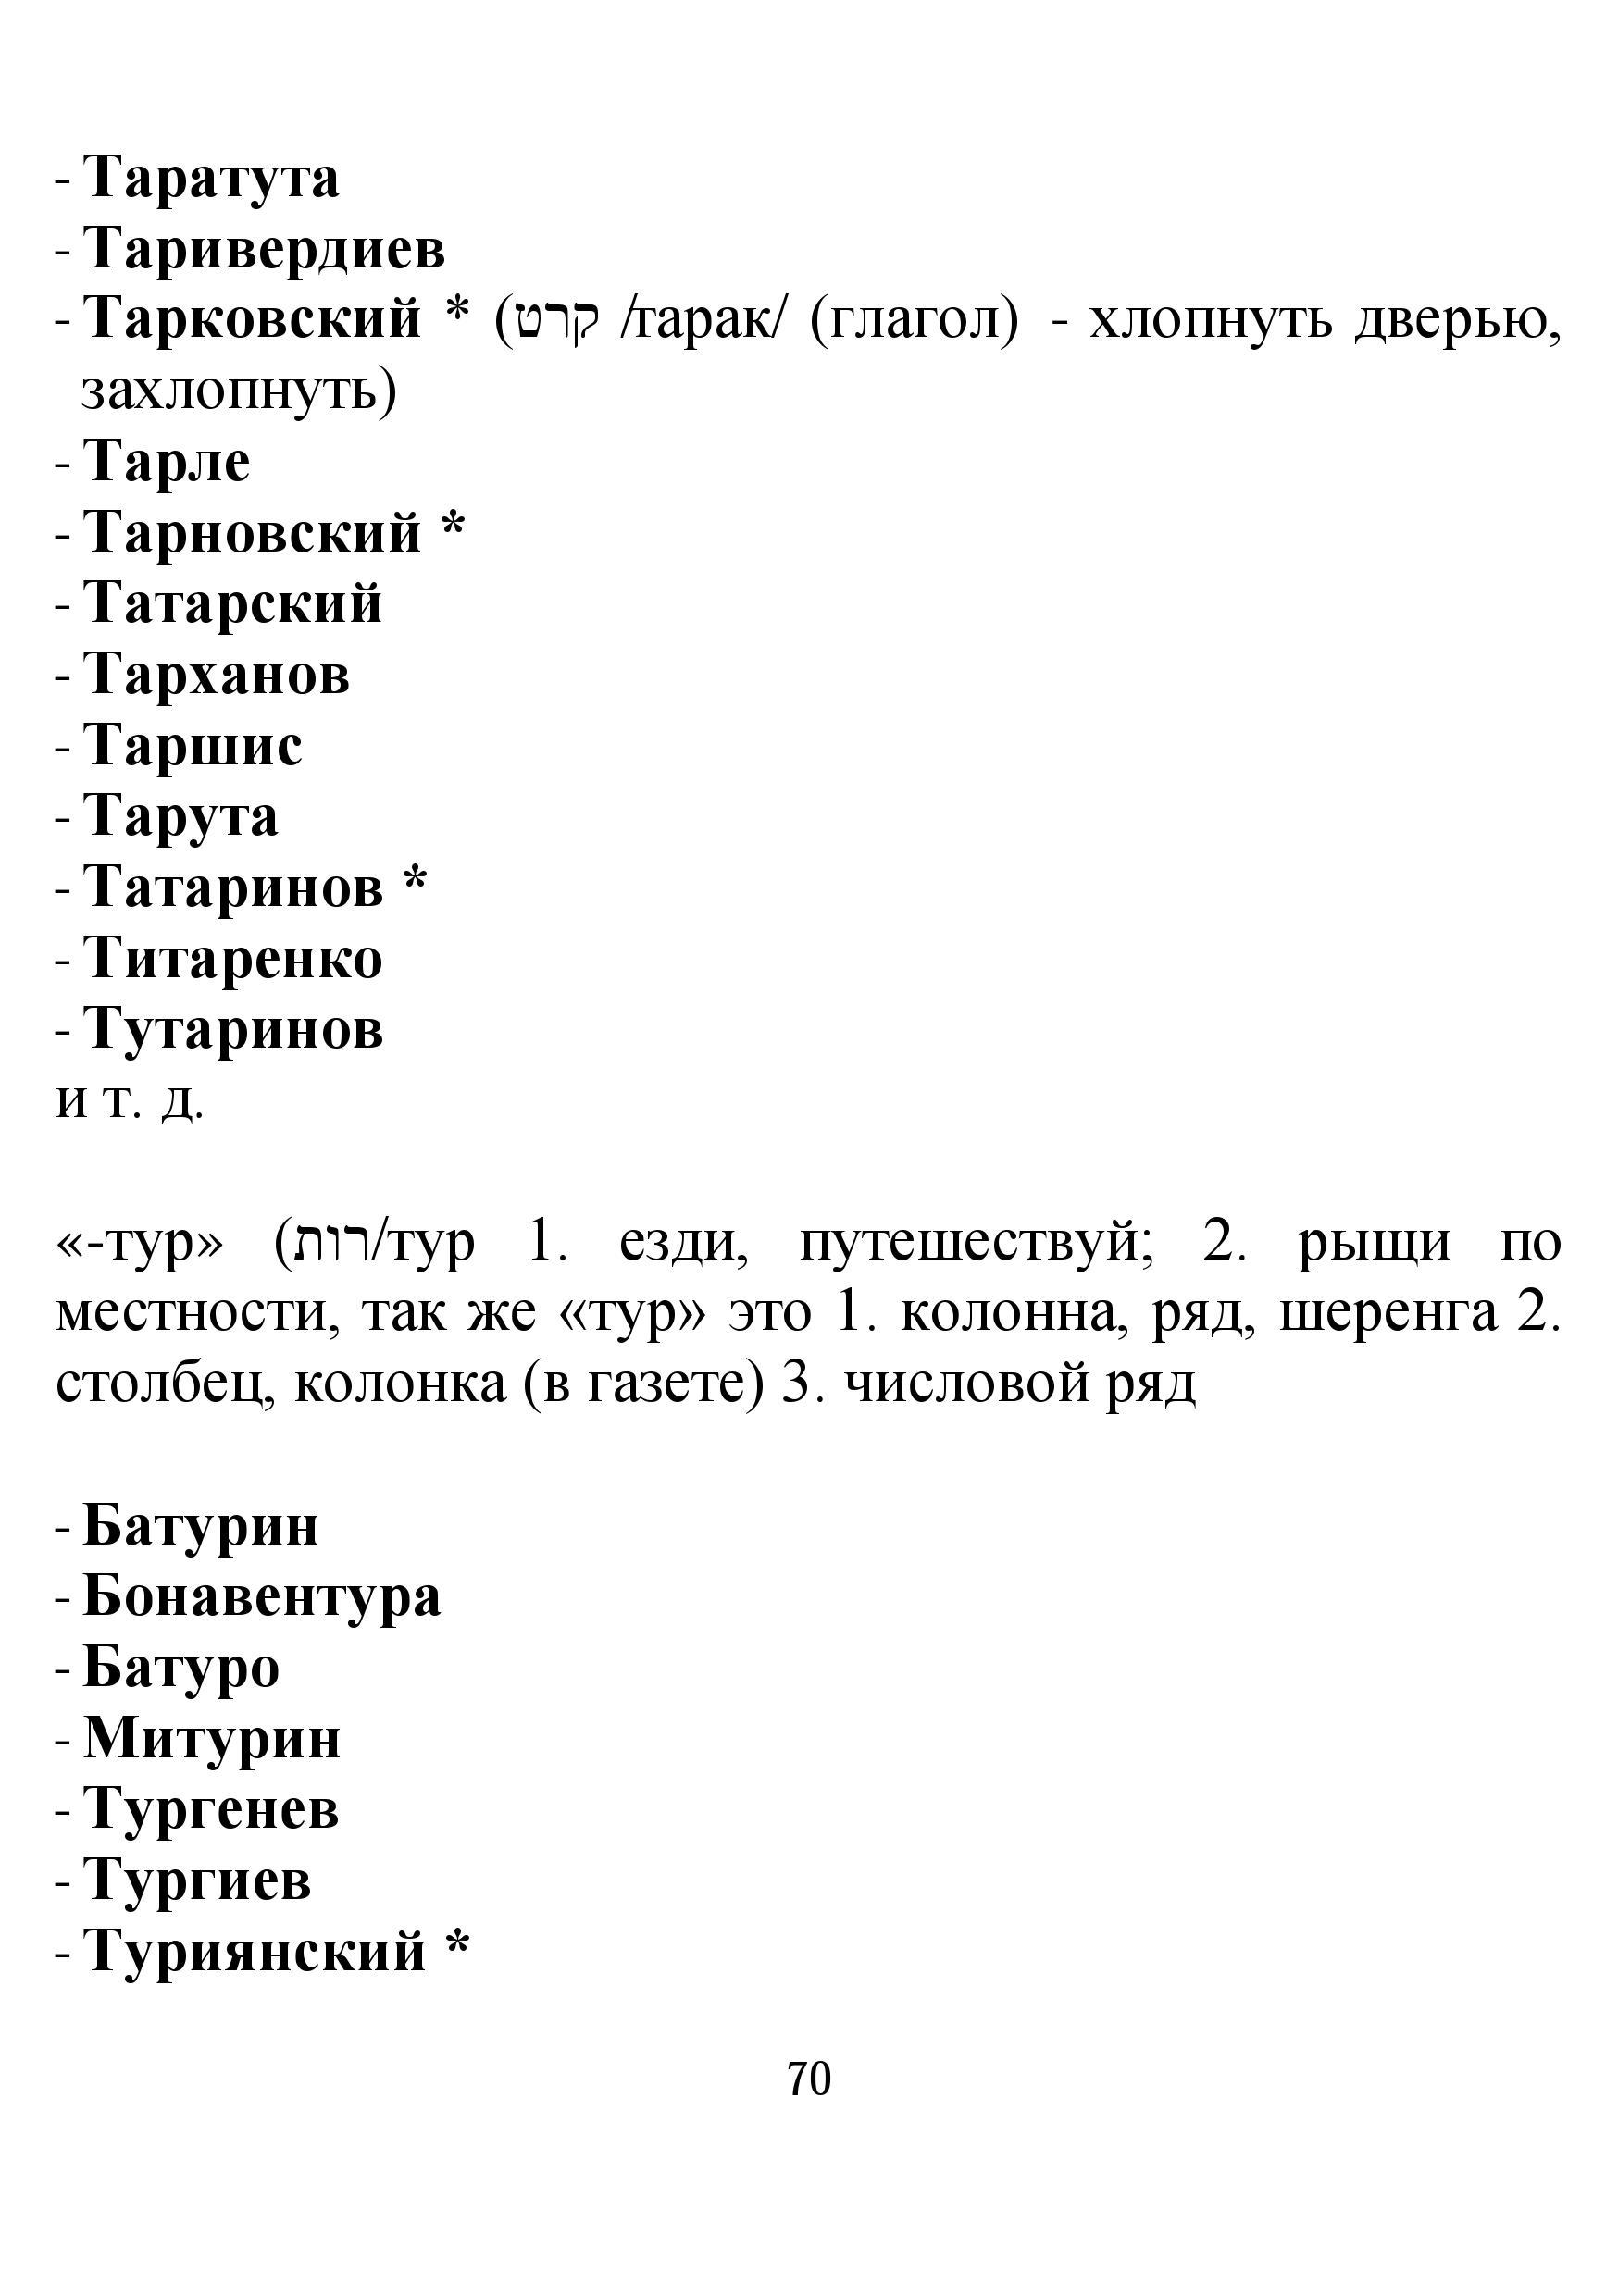 http://s0.uploads.ru/FeoTK.jpg